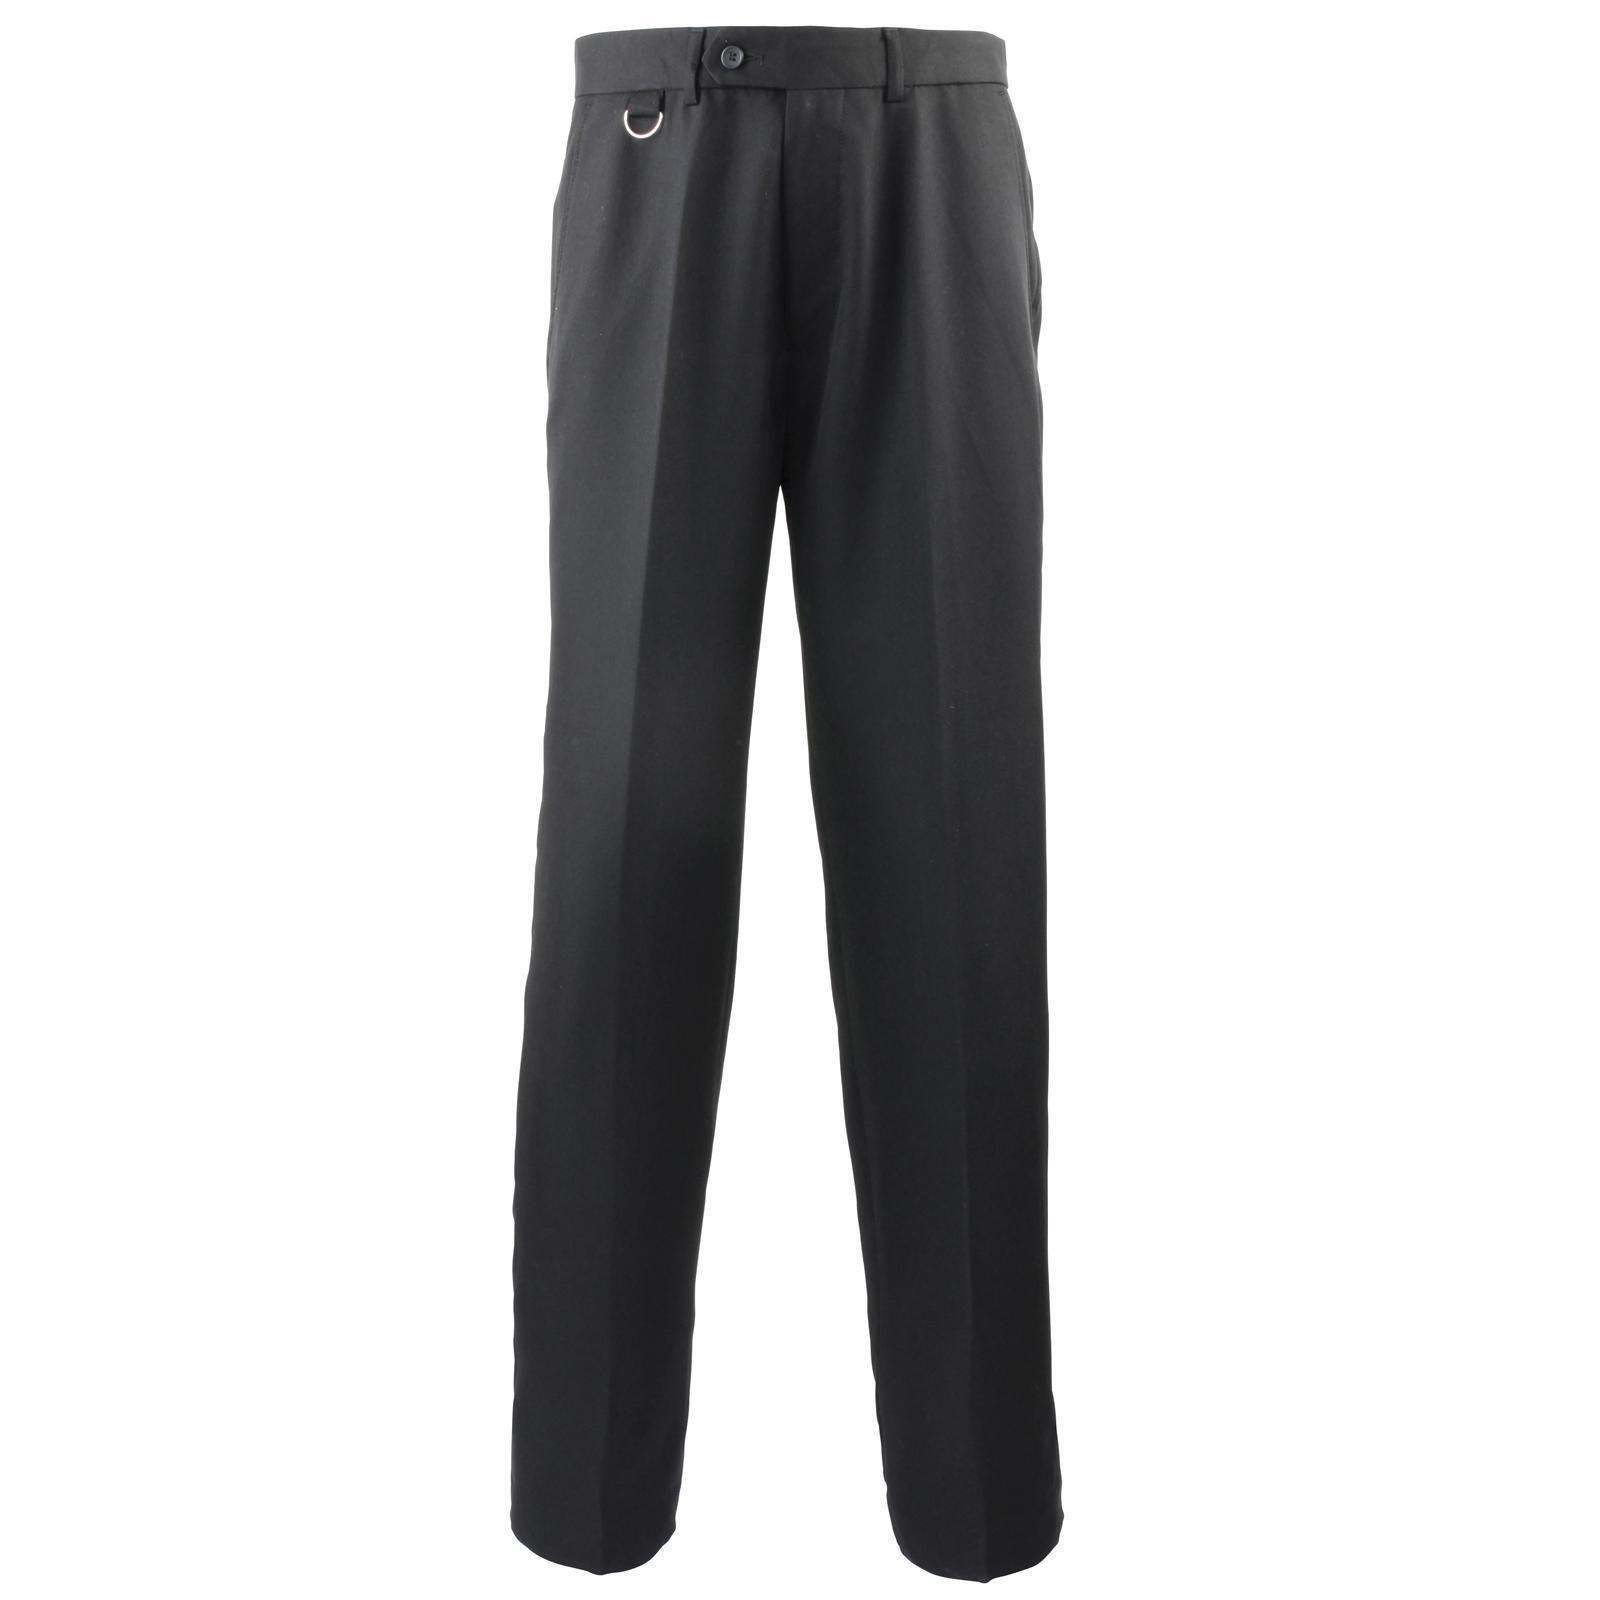 New PREMIER Mens Flat Front Hospitality Trouser in Sky Navy 30 - 42